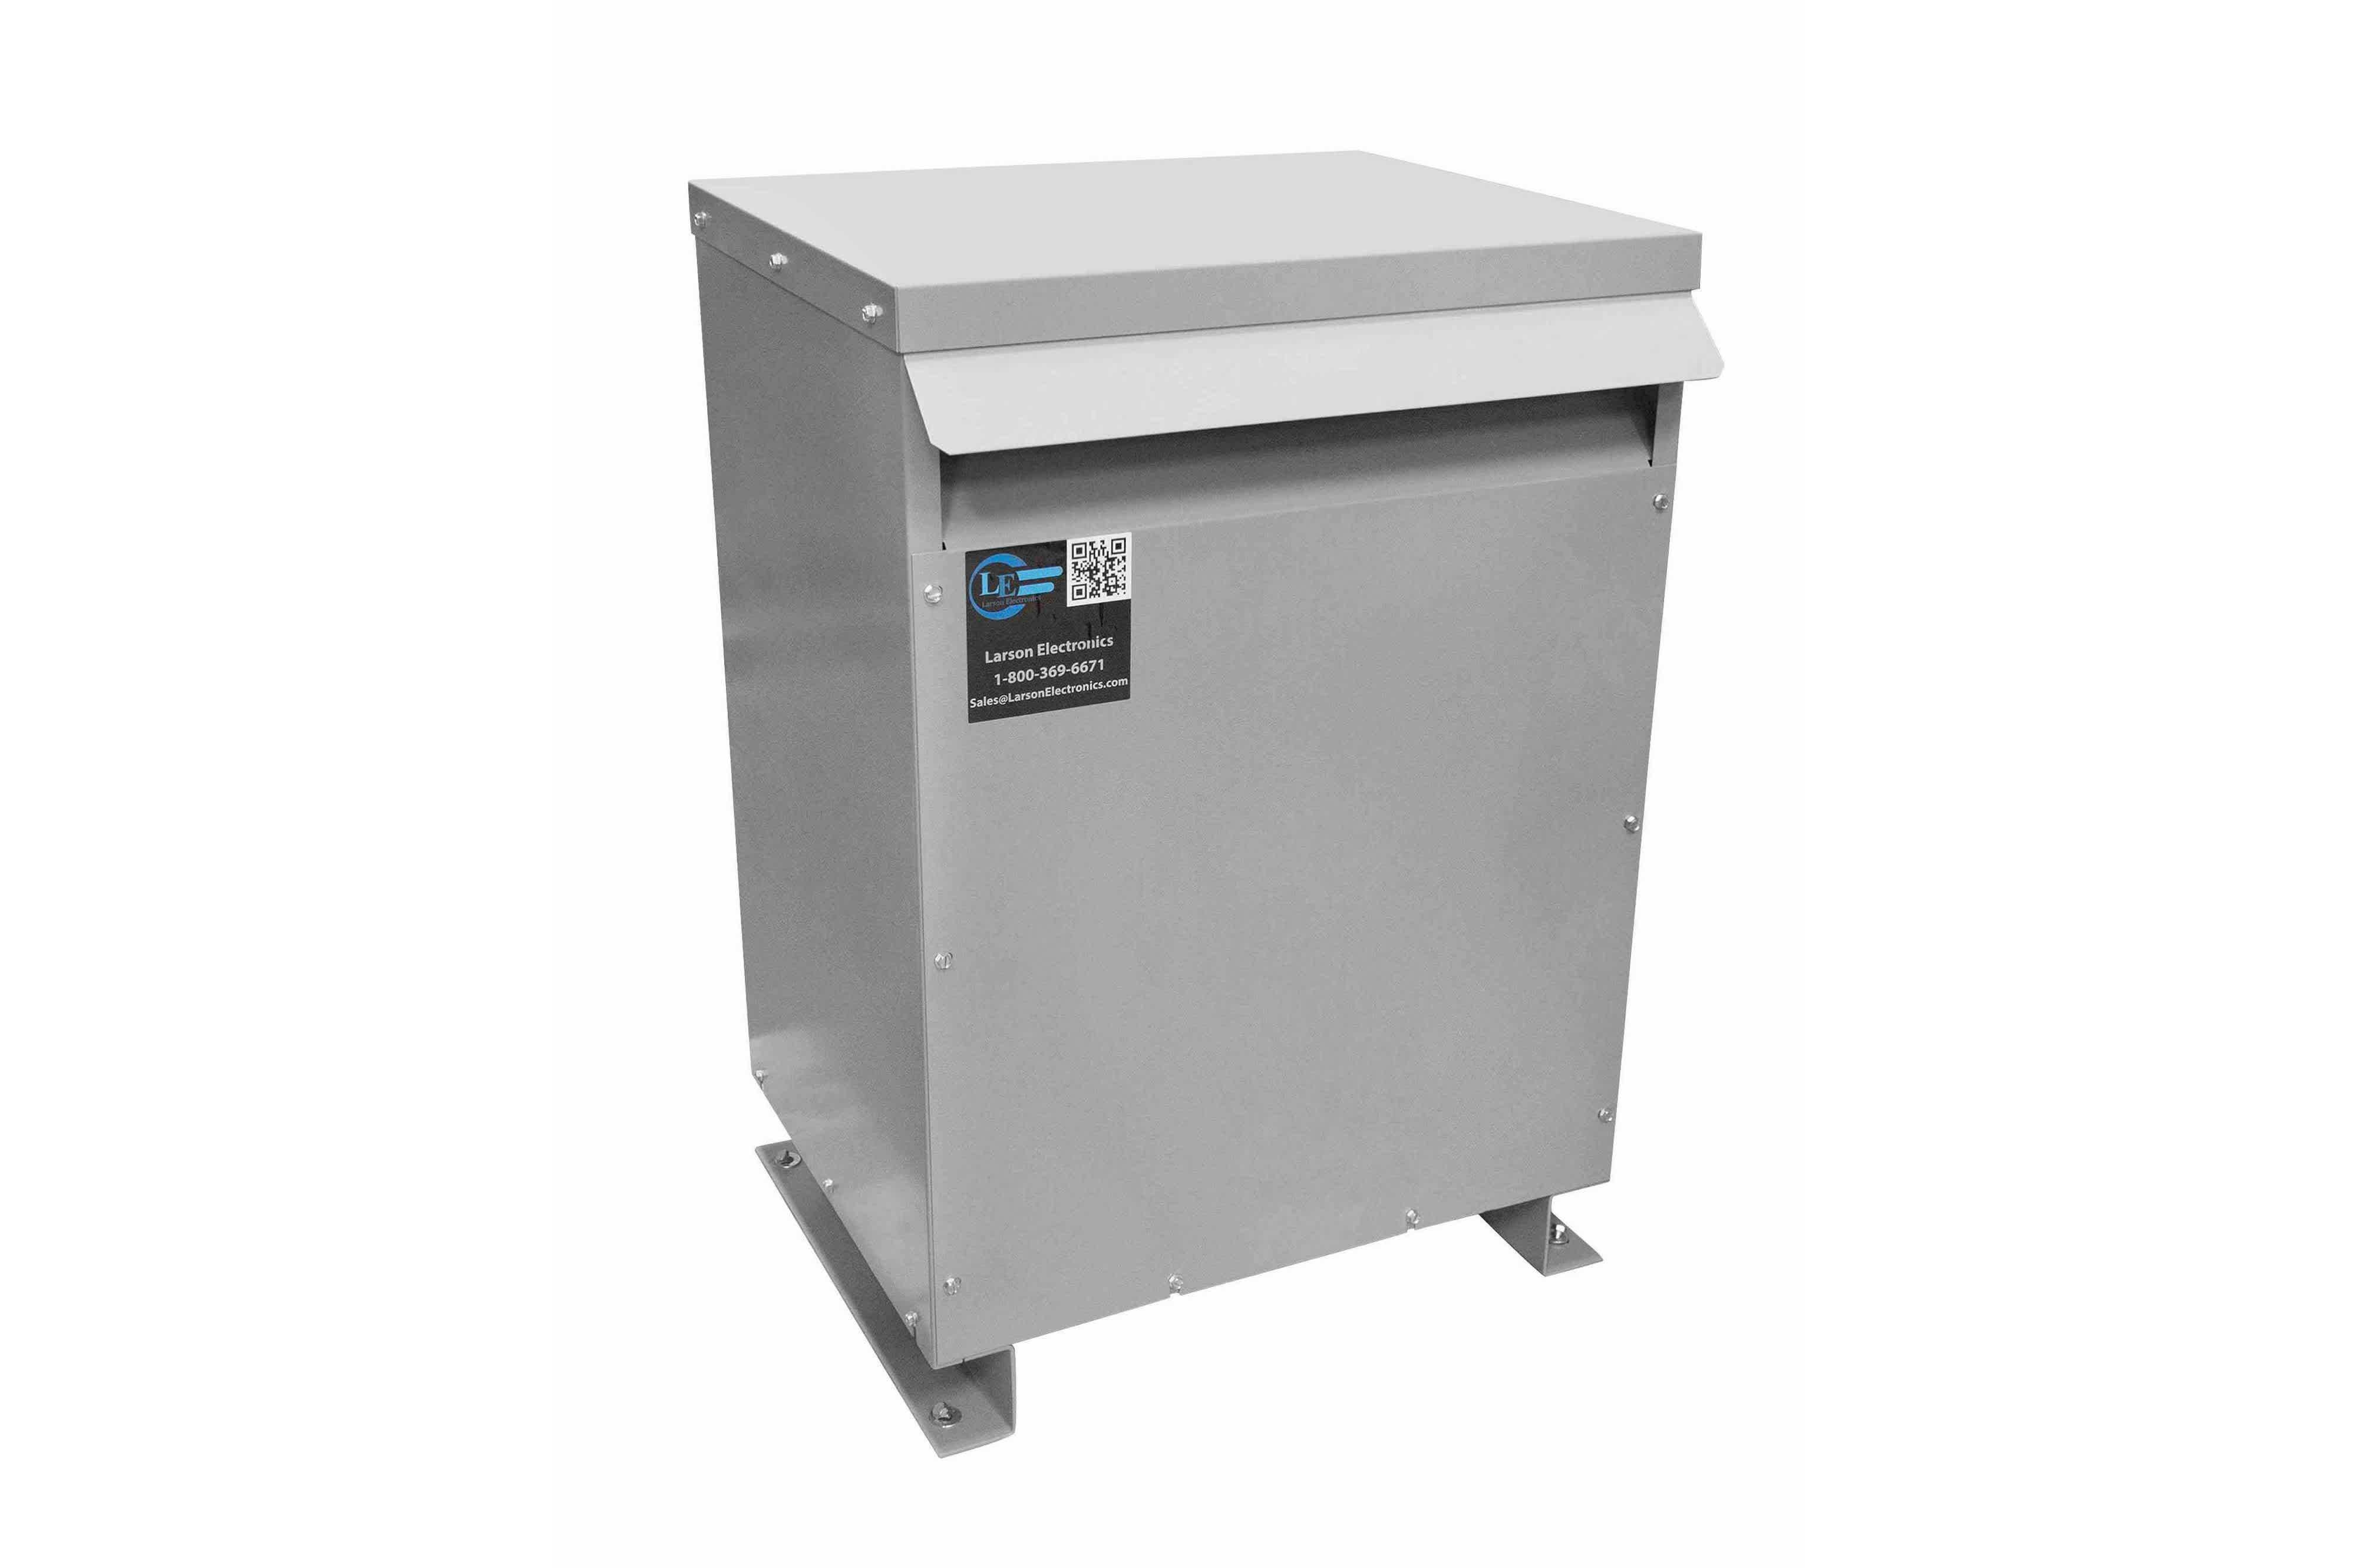 18 kVA 3PH Isolation Transformer, 480V Wye Primary, 480Y/277 Wye-N Secondary, N3R, Ventilated, 60 Hz